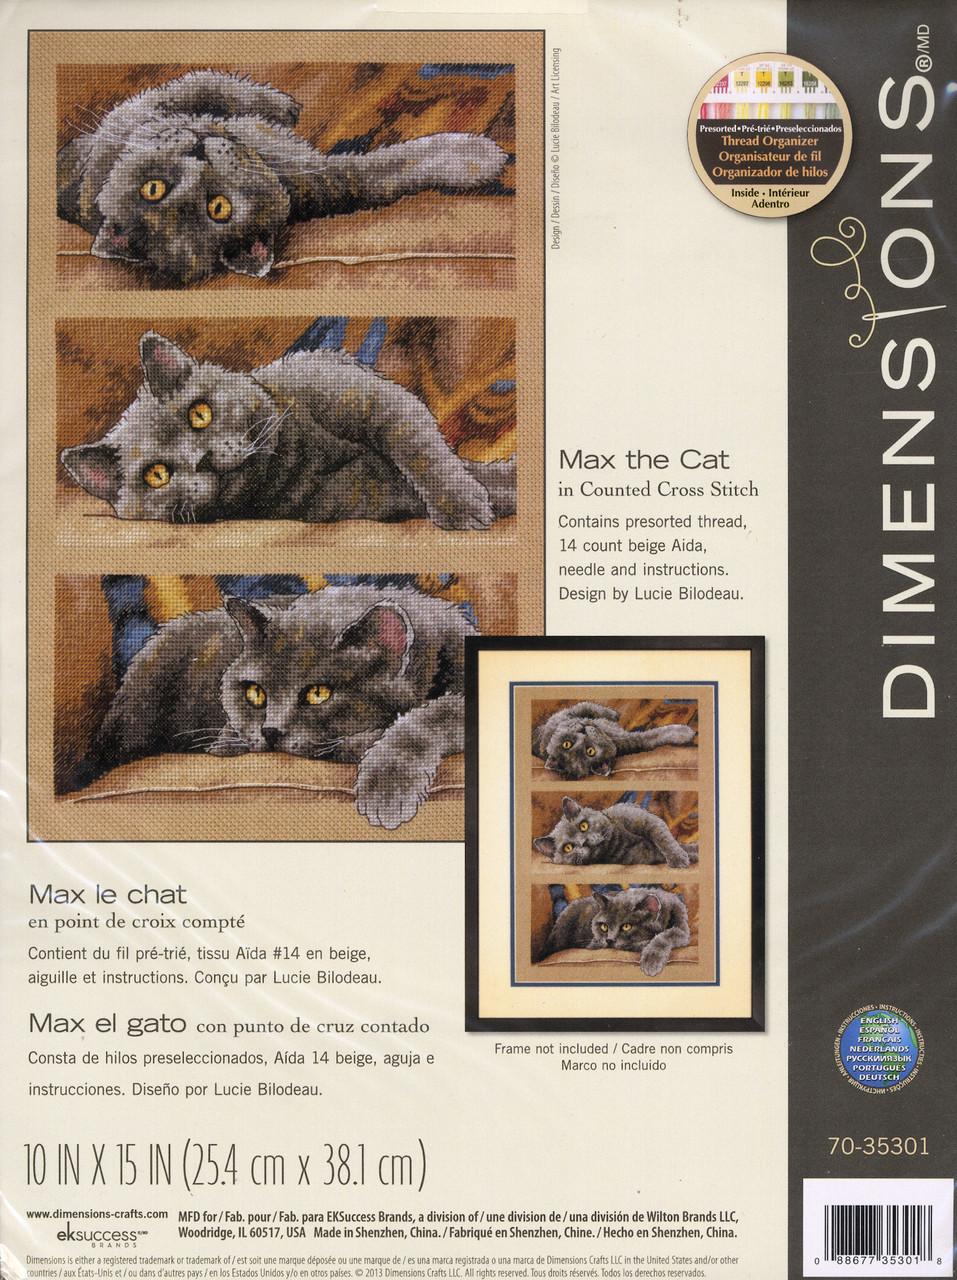 Dimensions - Max the Cat